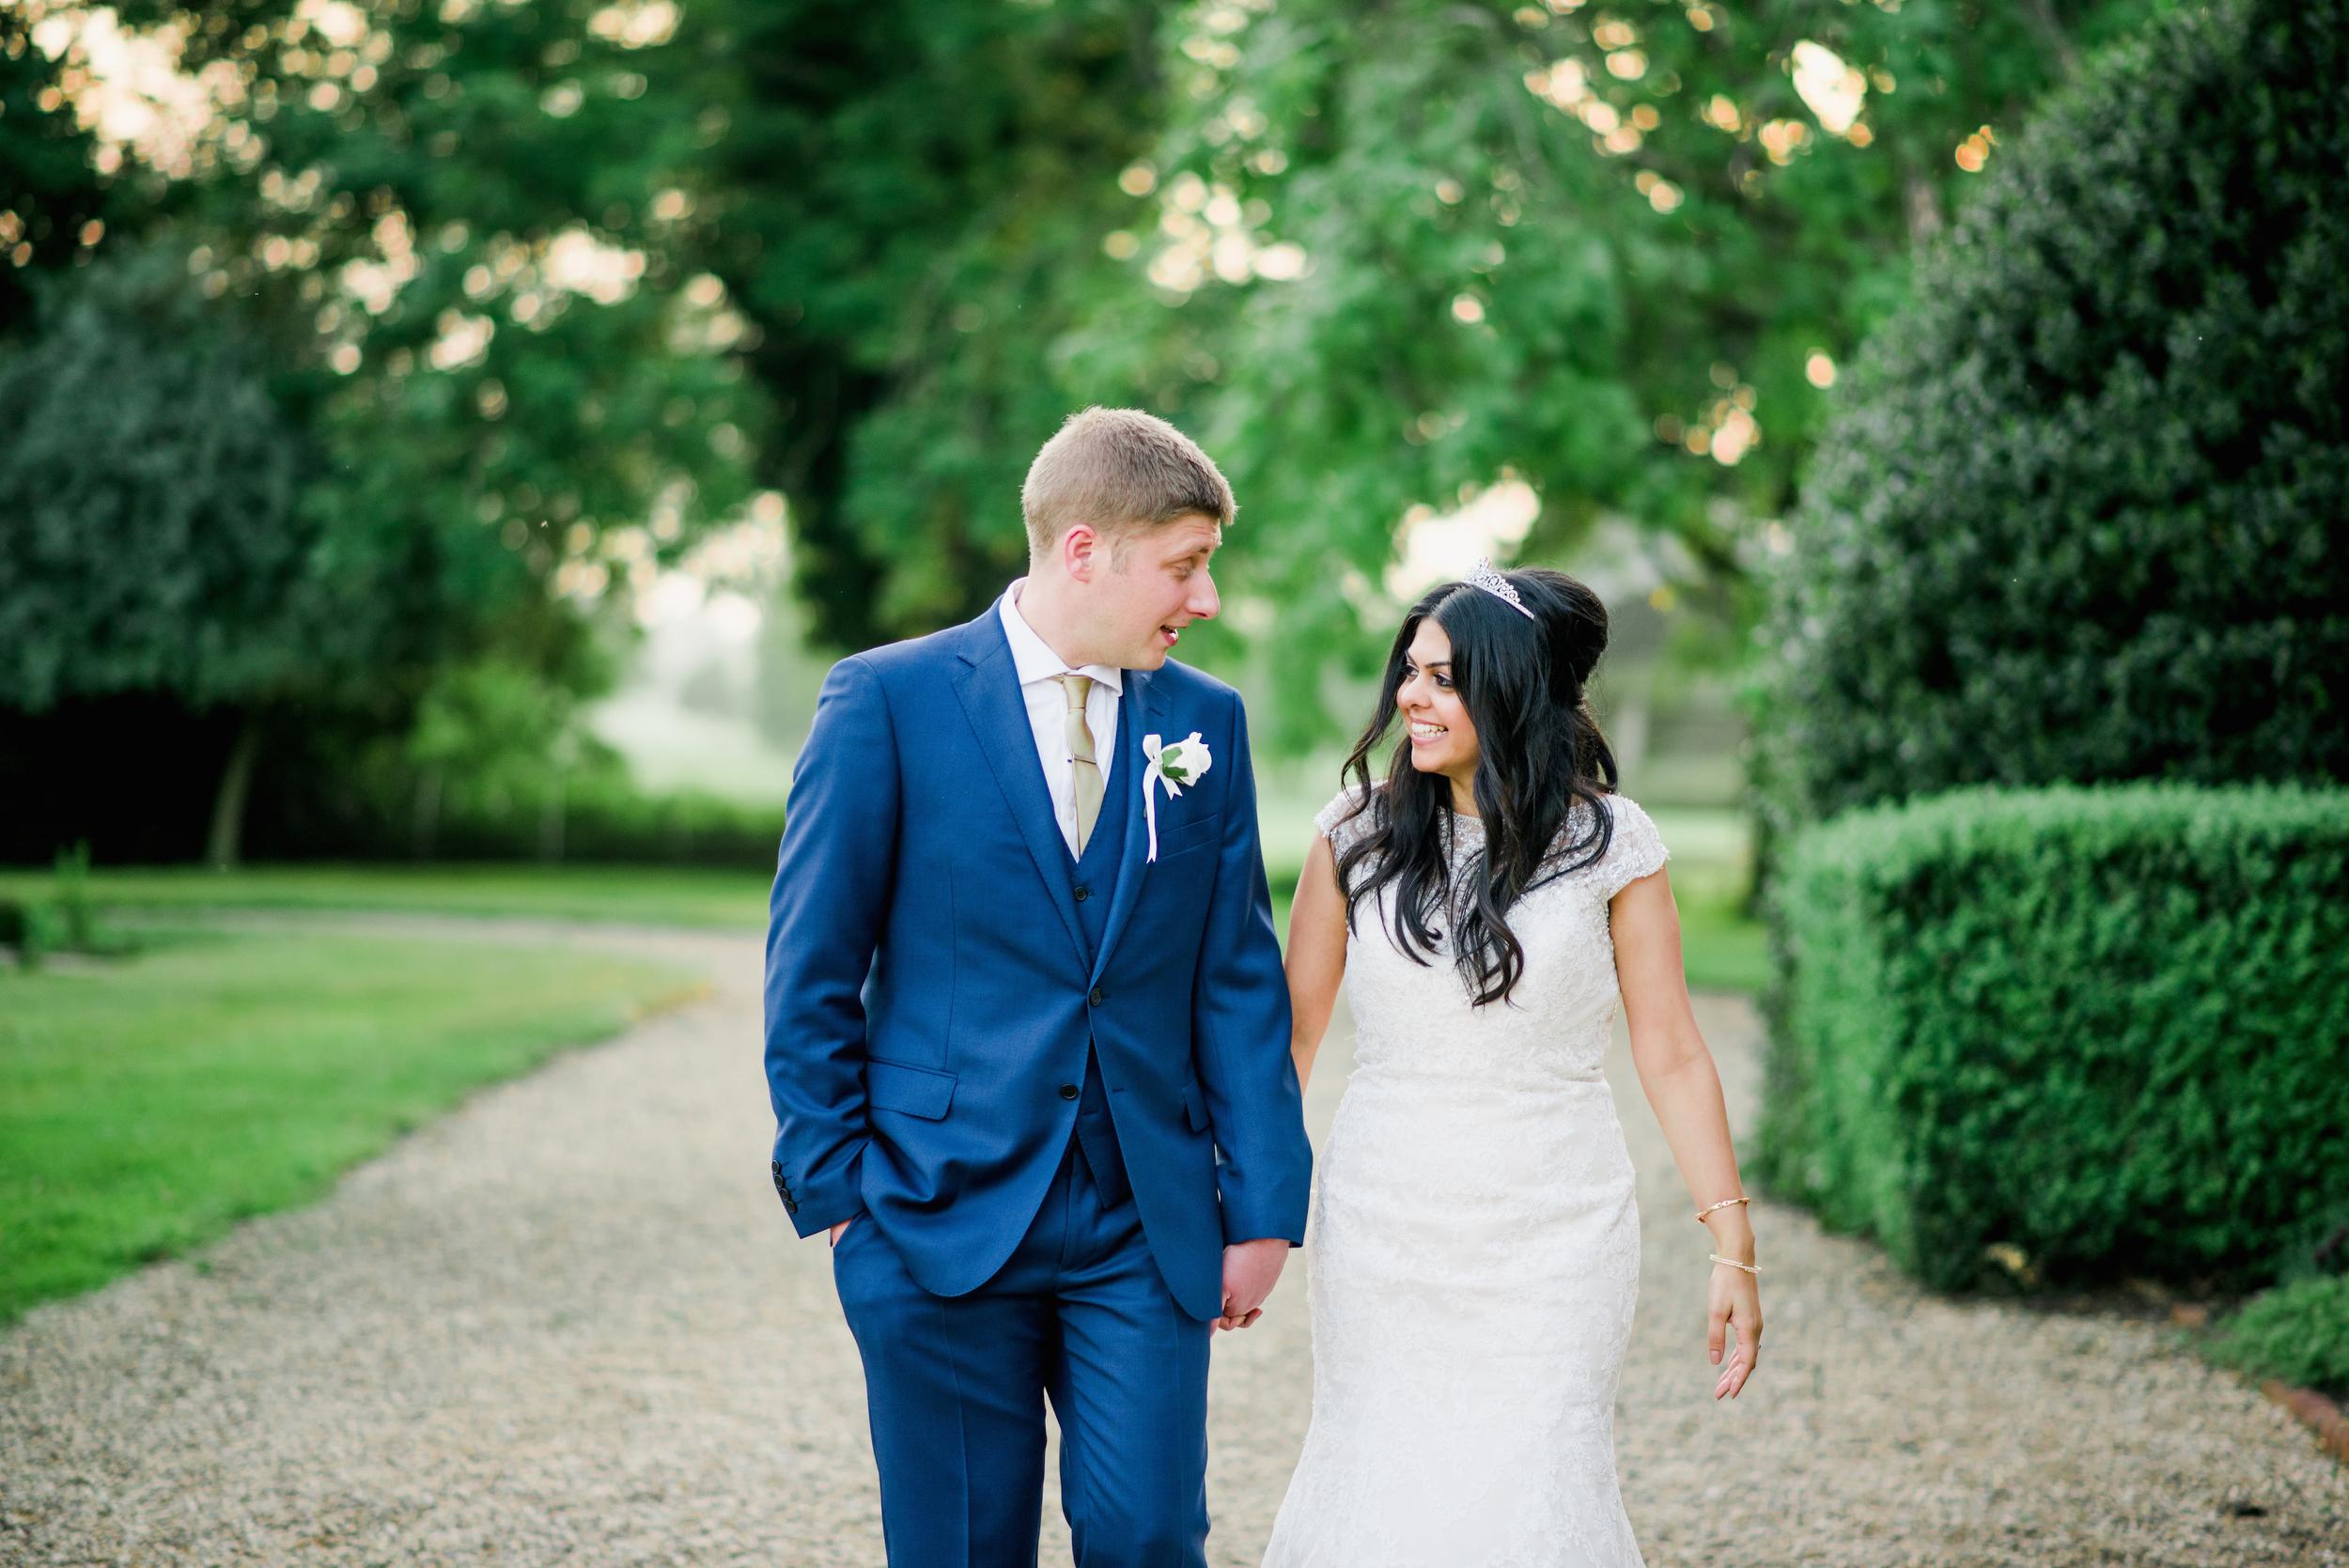 22 Bride Groom Essex Wedding Photography Gosfield Hall.jpg